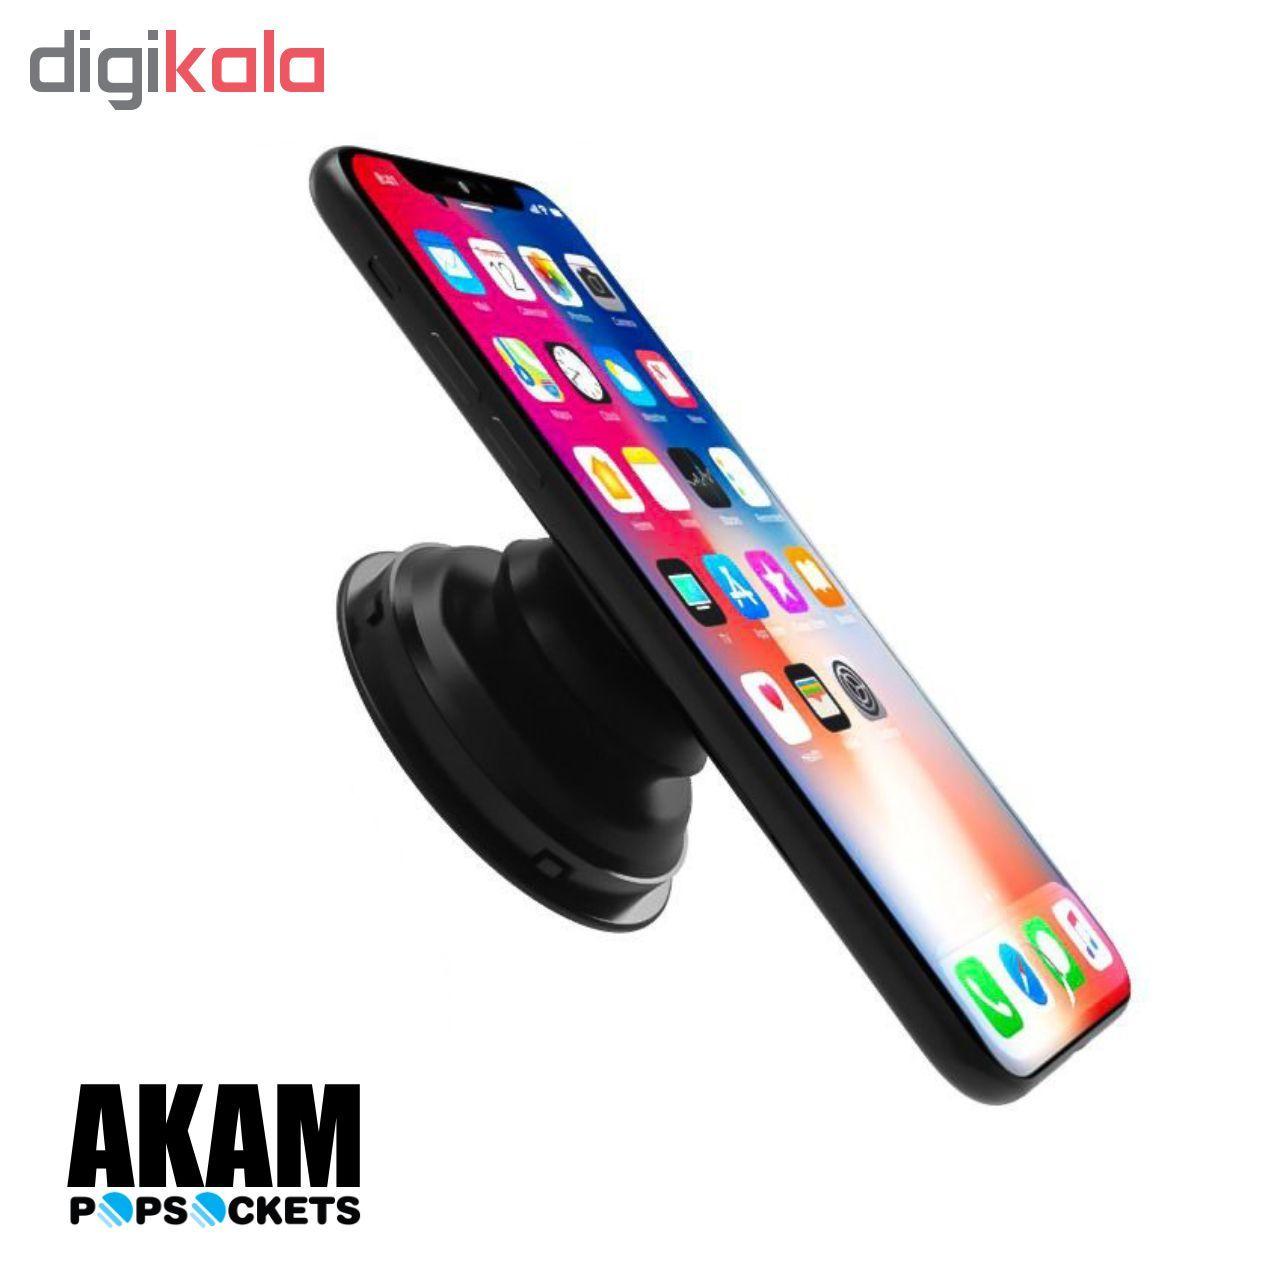 پایه نگهدارنده گوشی موبایل پاپ سوکت آکام مدل APS0211 main 1 6